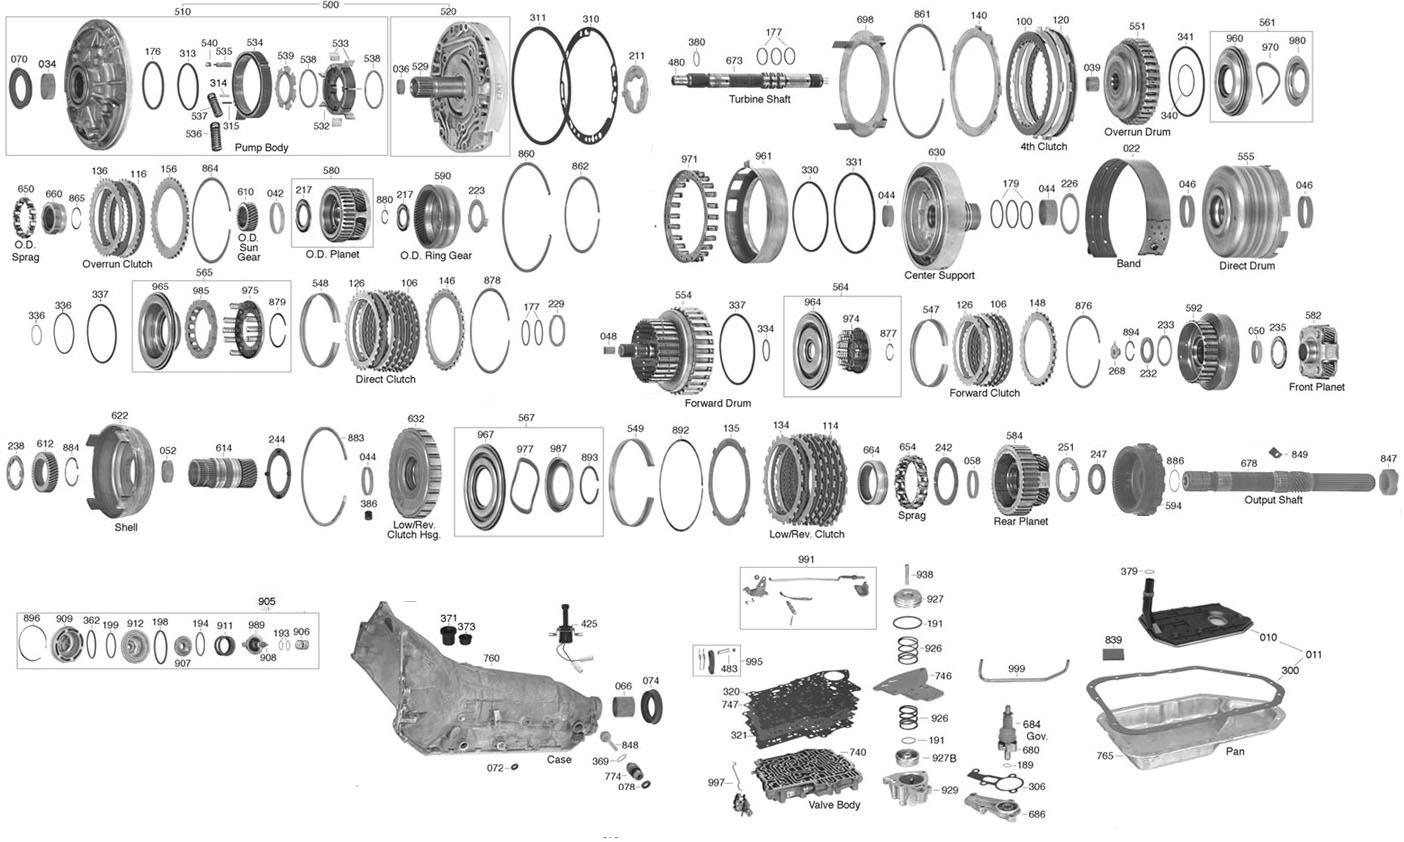 hight resolution of chevy 700r4 transmission rebuild diagram 700r4 automatic transmission diagram 700r4 valve body diagram